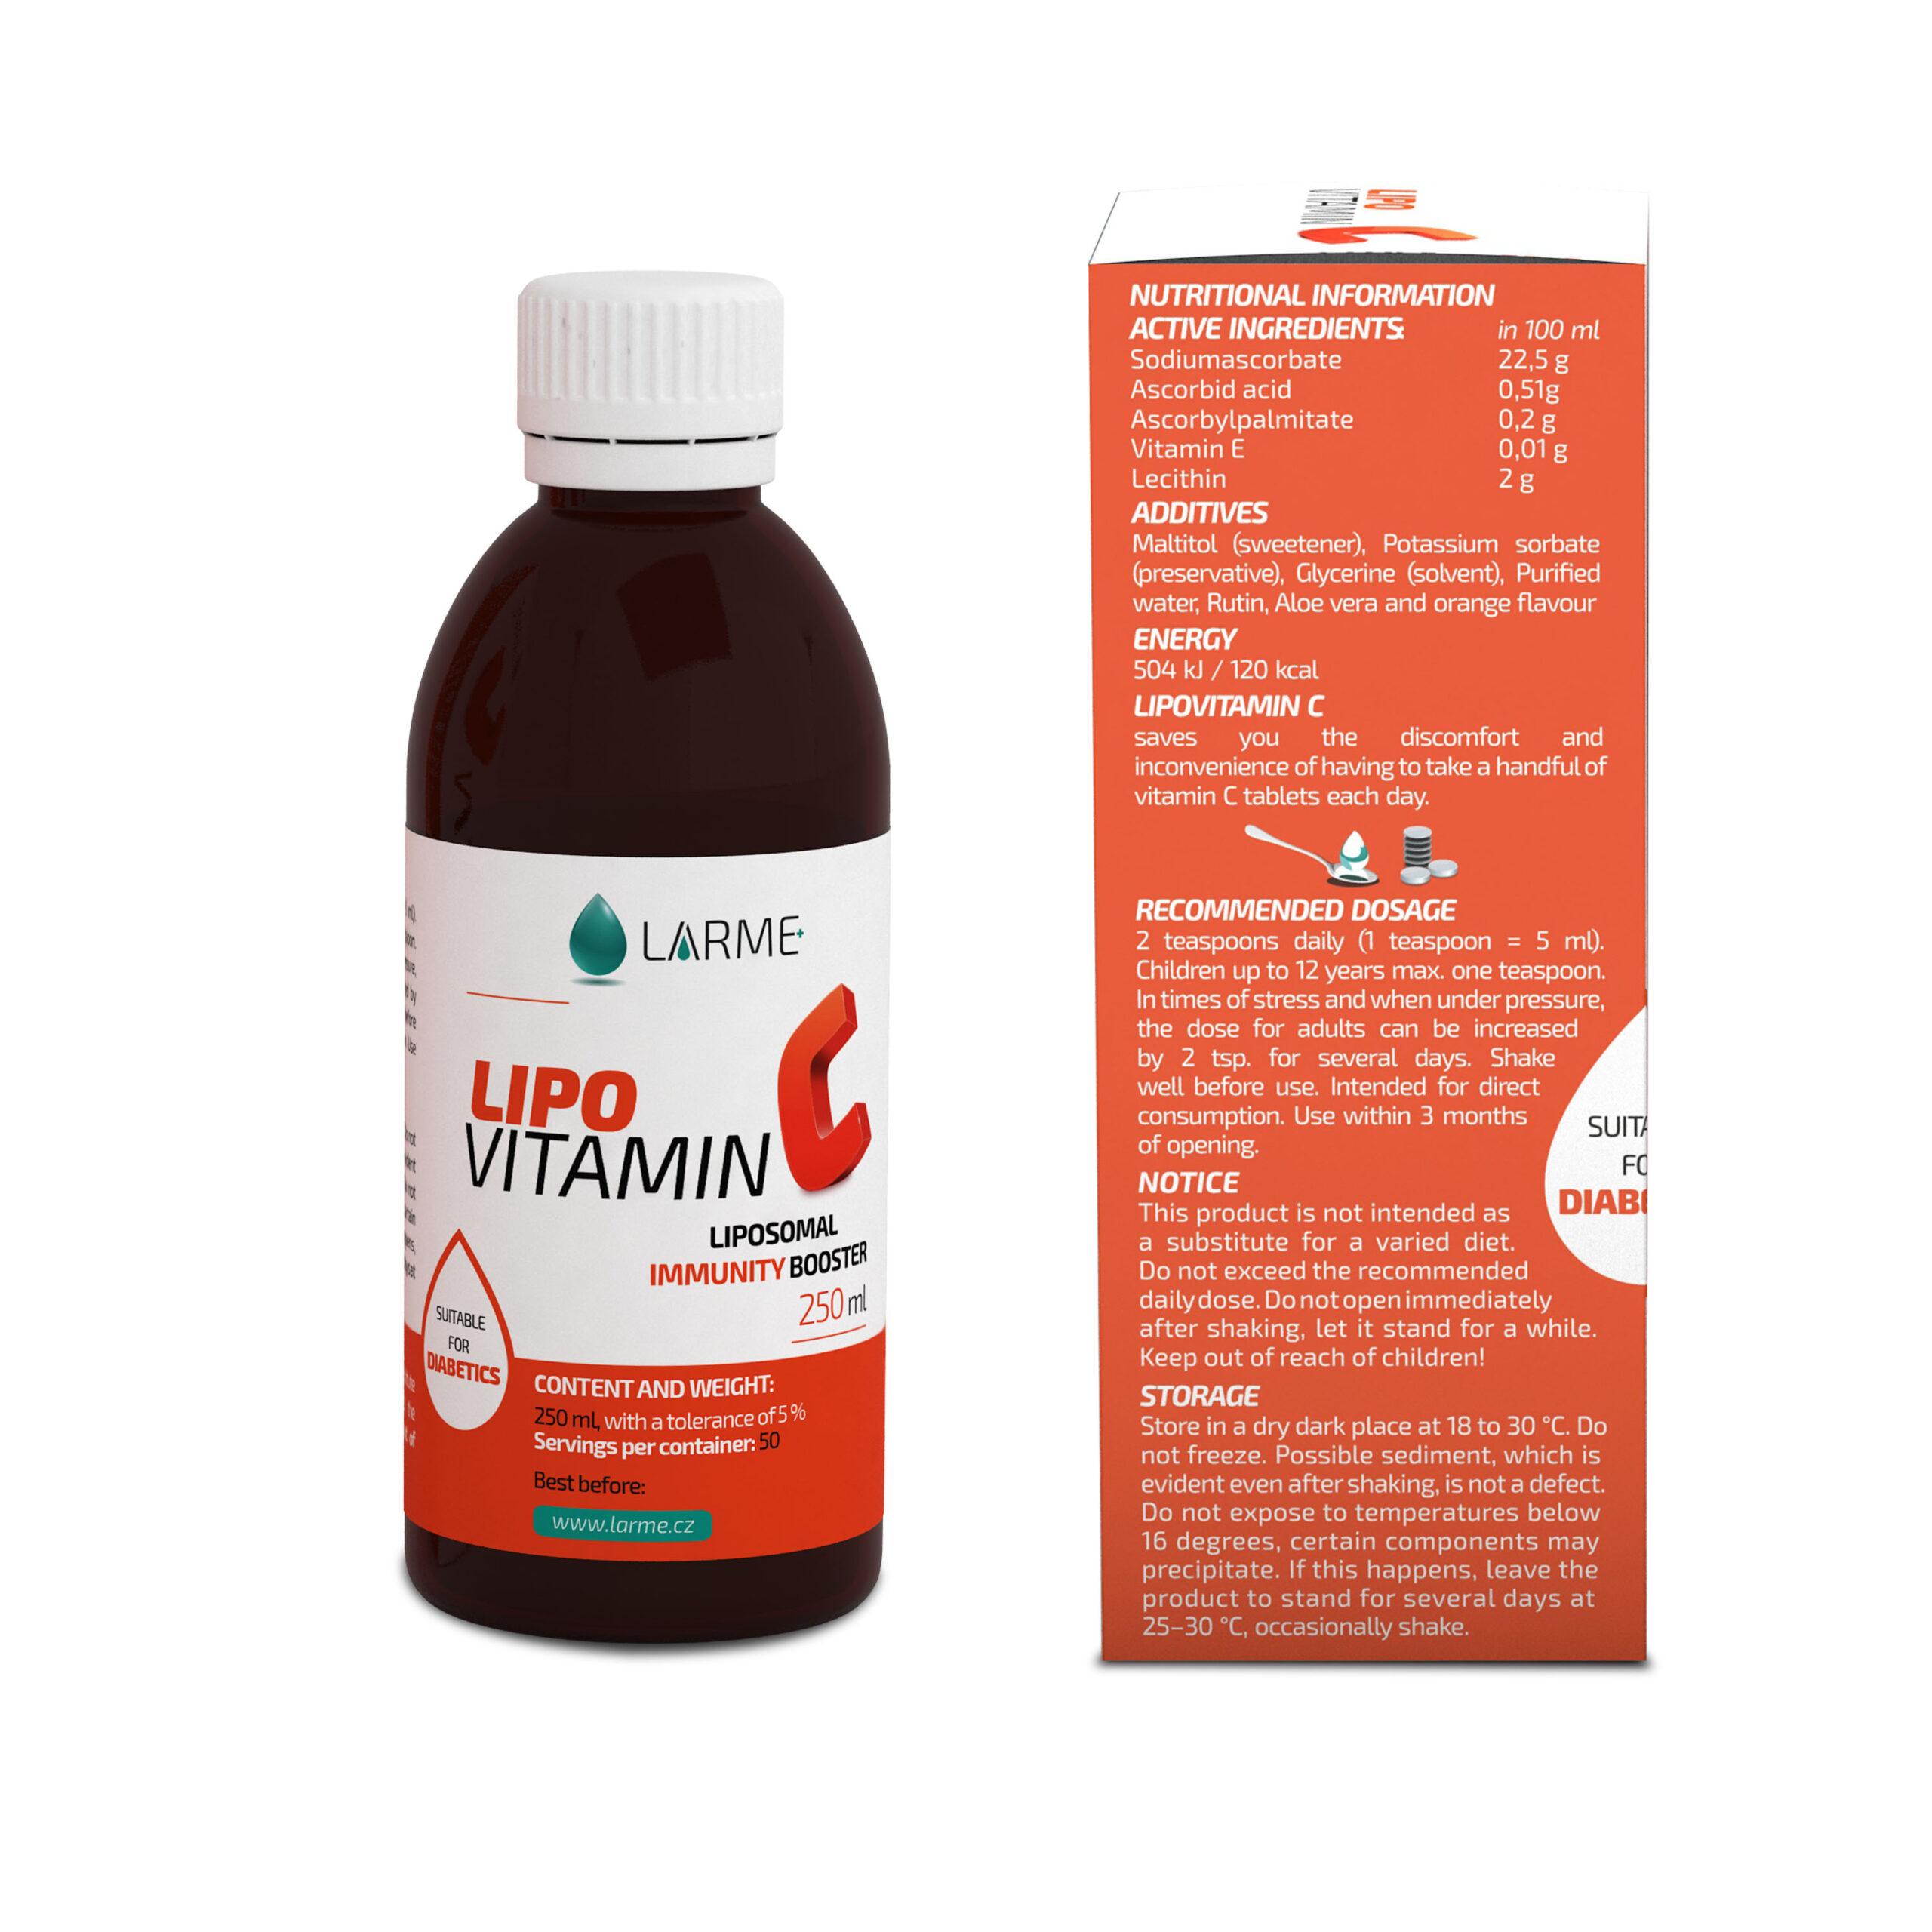 LIPOVITAMIN C®